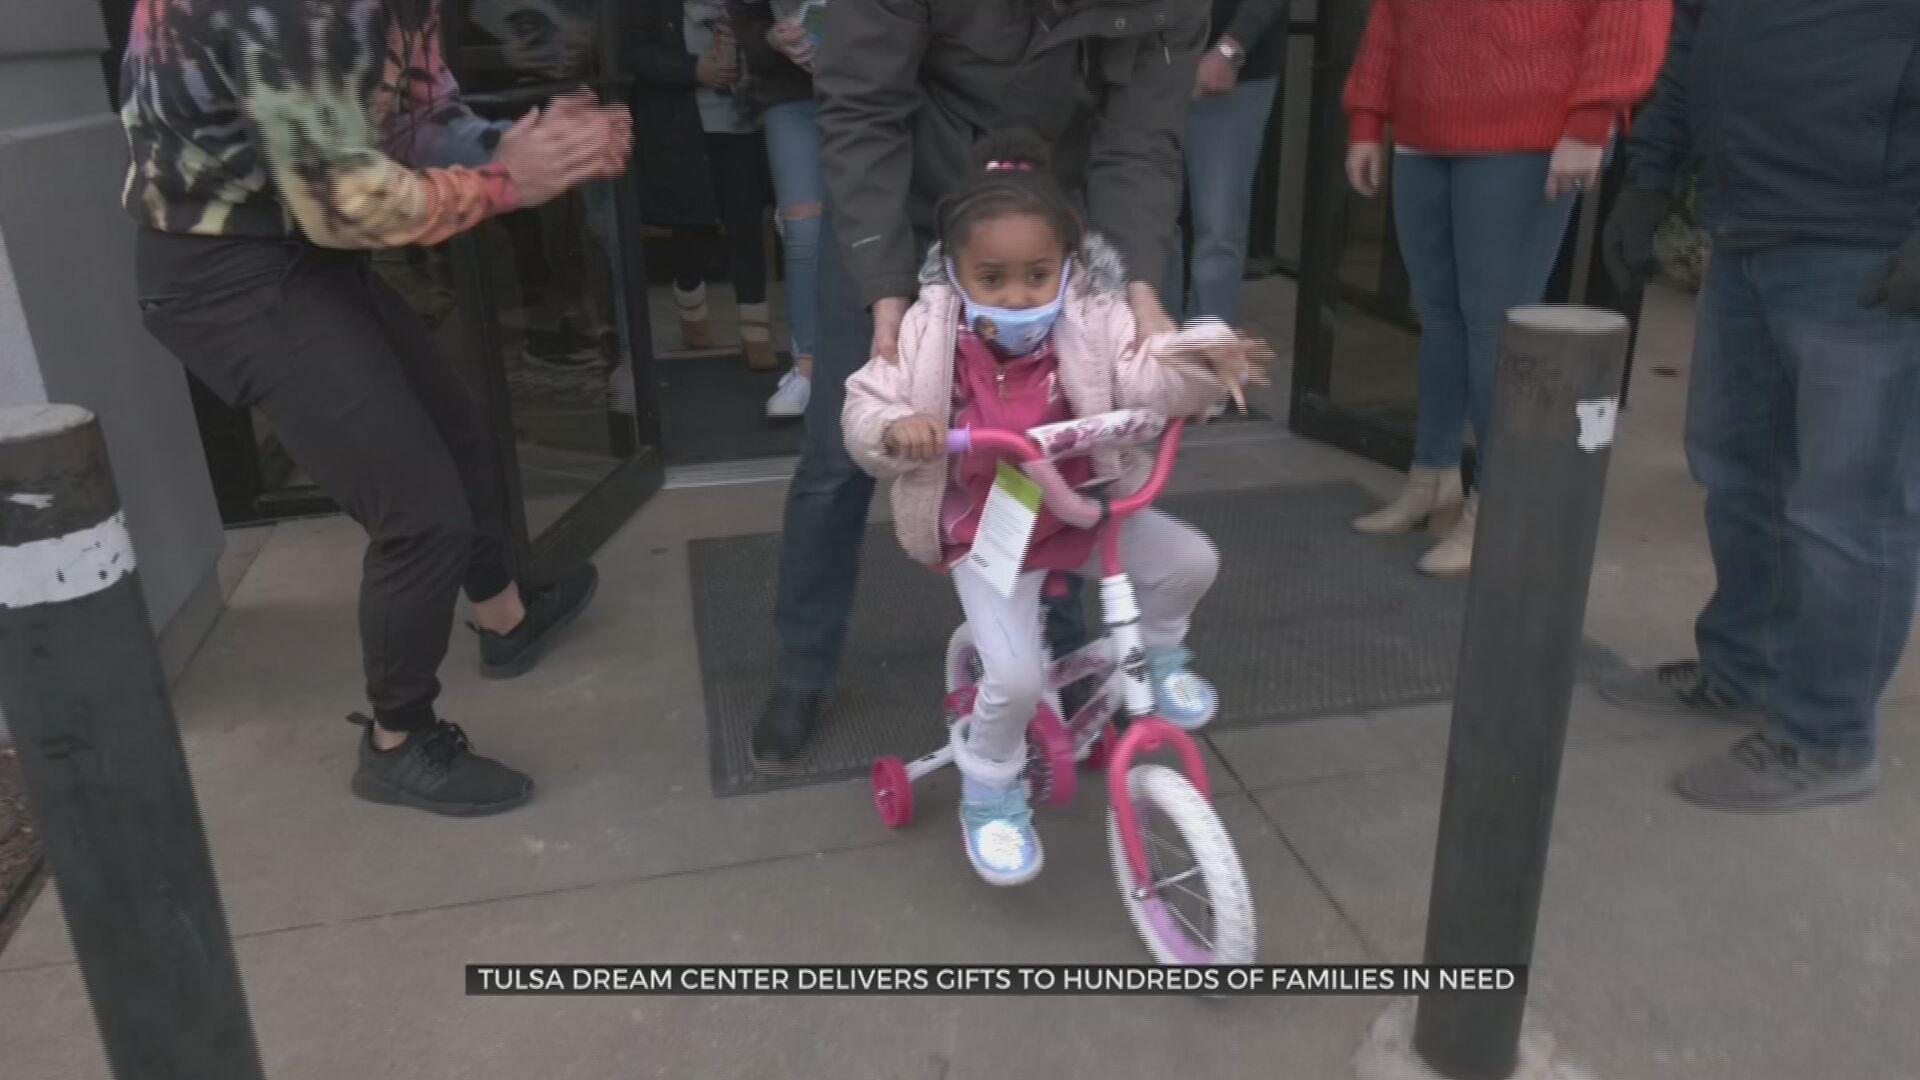 Nonprofit Makes Christmas Dreams Come True For Hundreds Of Tulsa Families